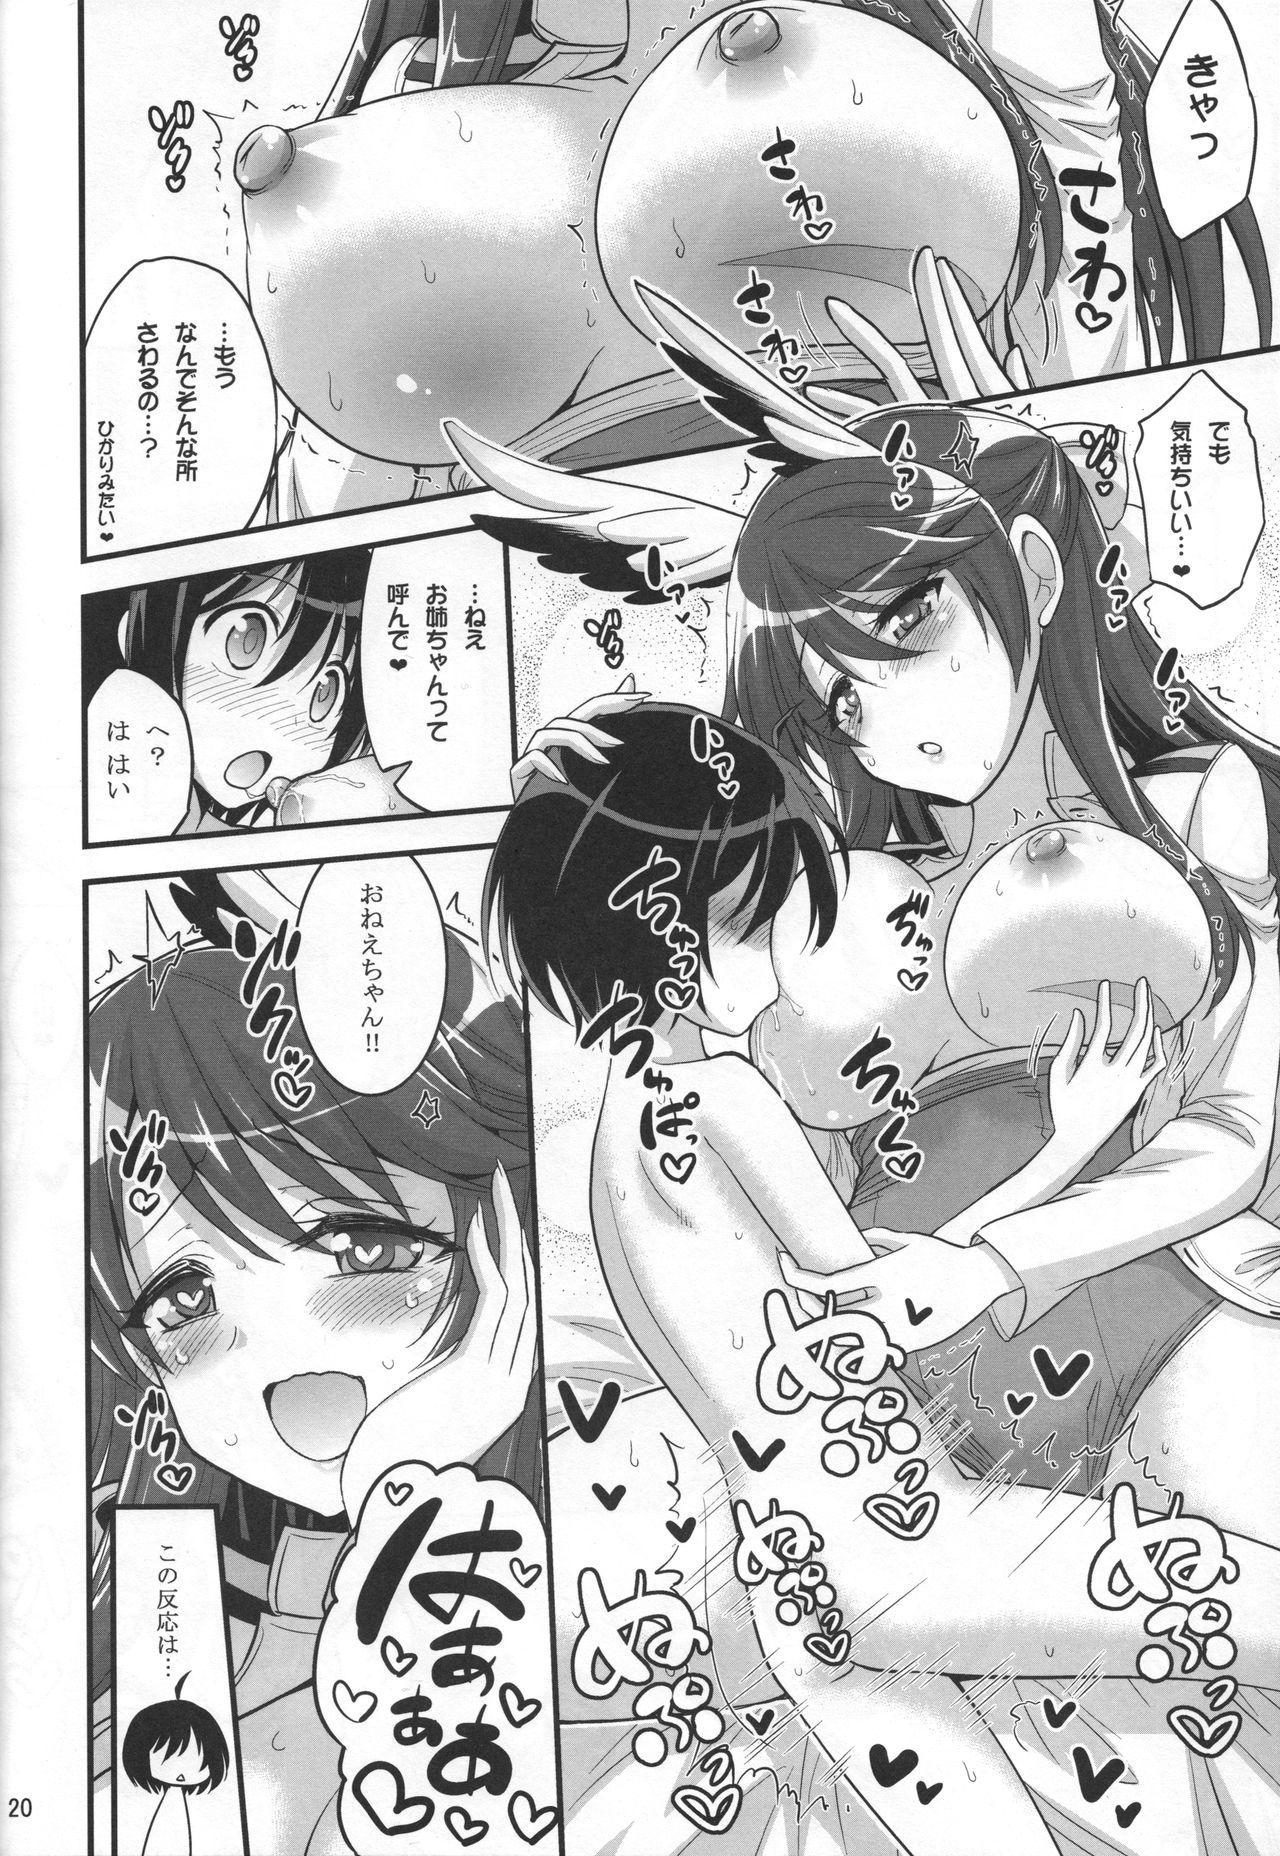 Onee-chan to Shota no Witch Night 18